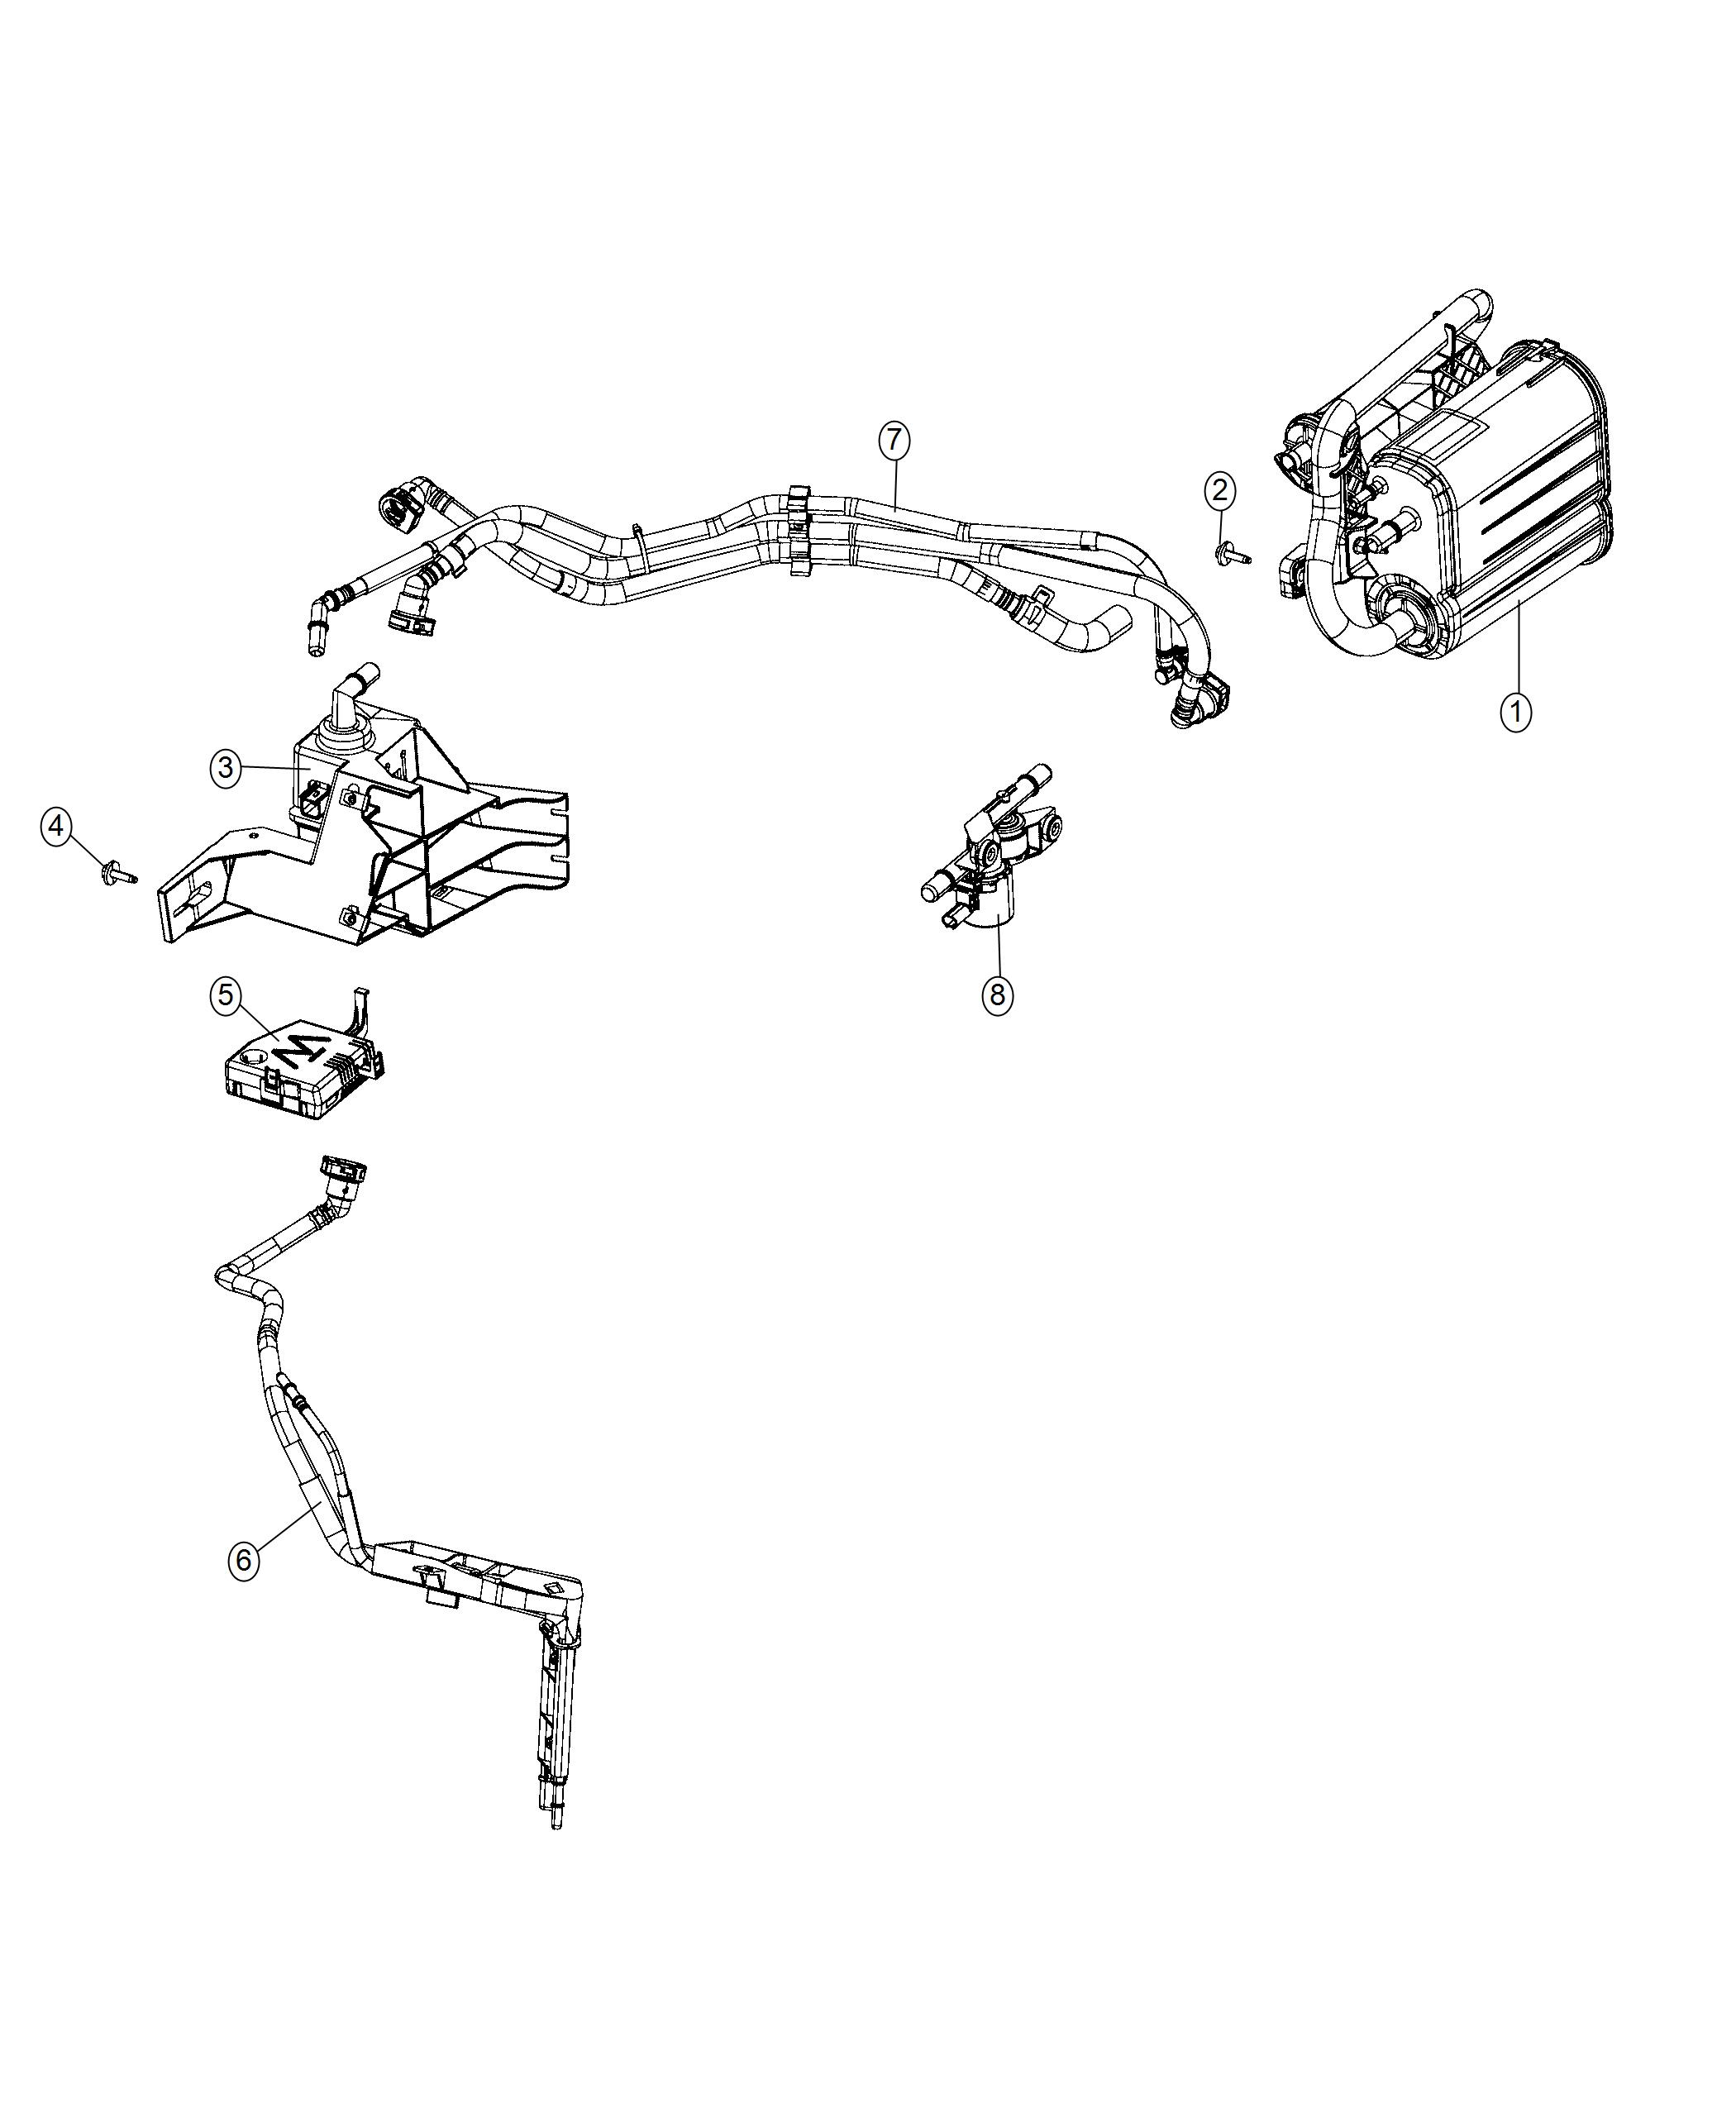 Chrysler Pacifica L Hybrid Vent Do Not Use Use